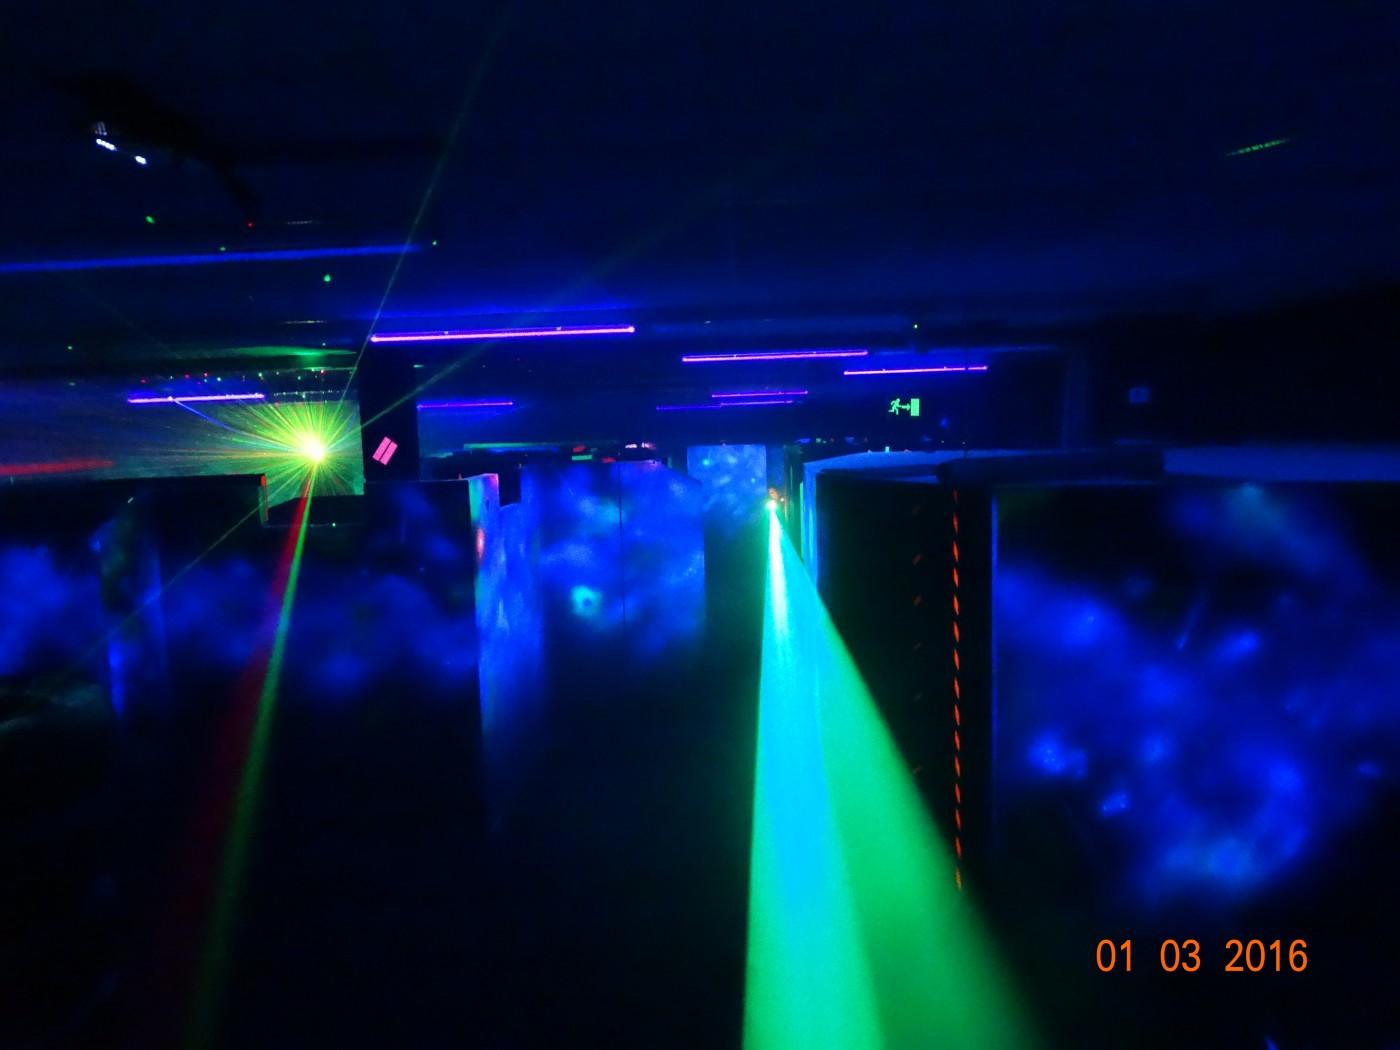 Lasergate UG (haftungsbeschrän